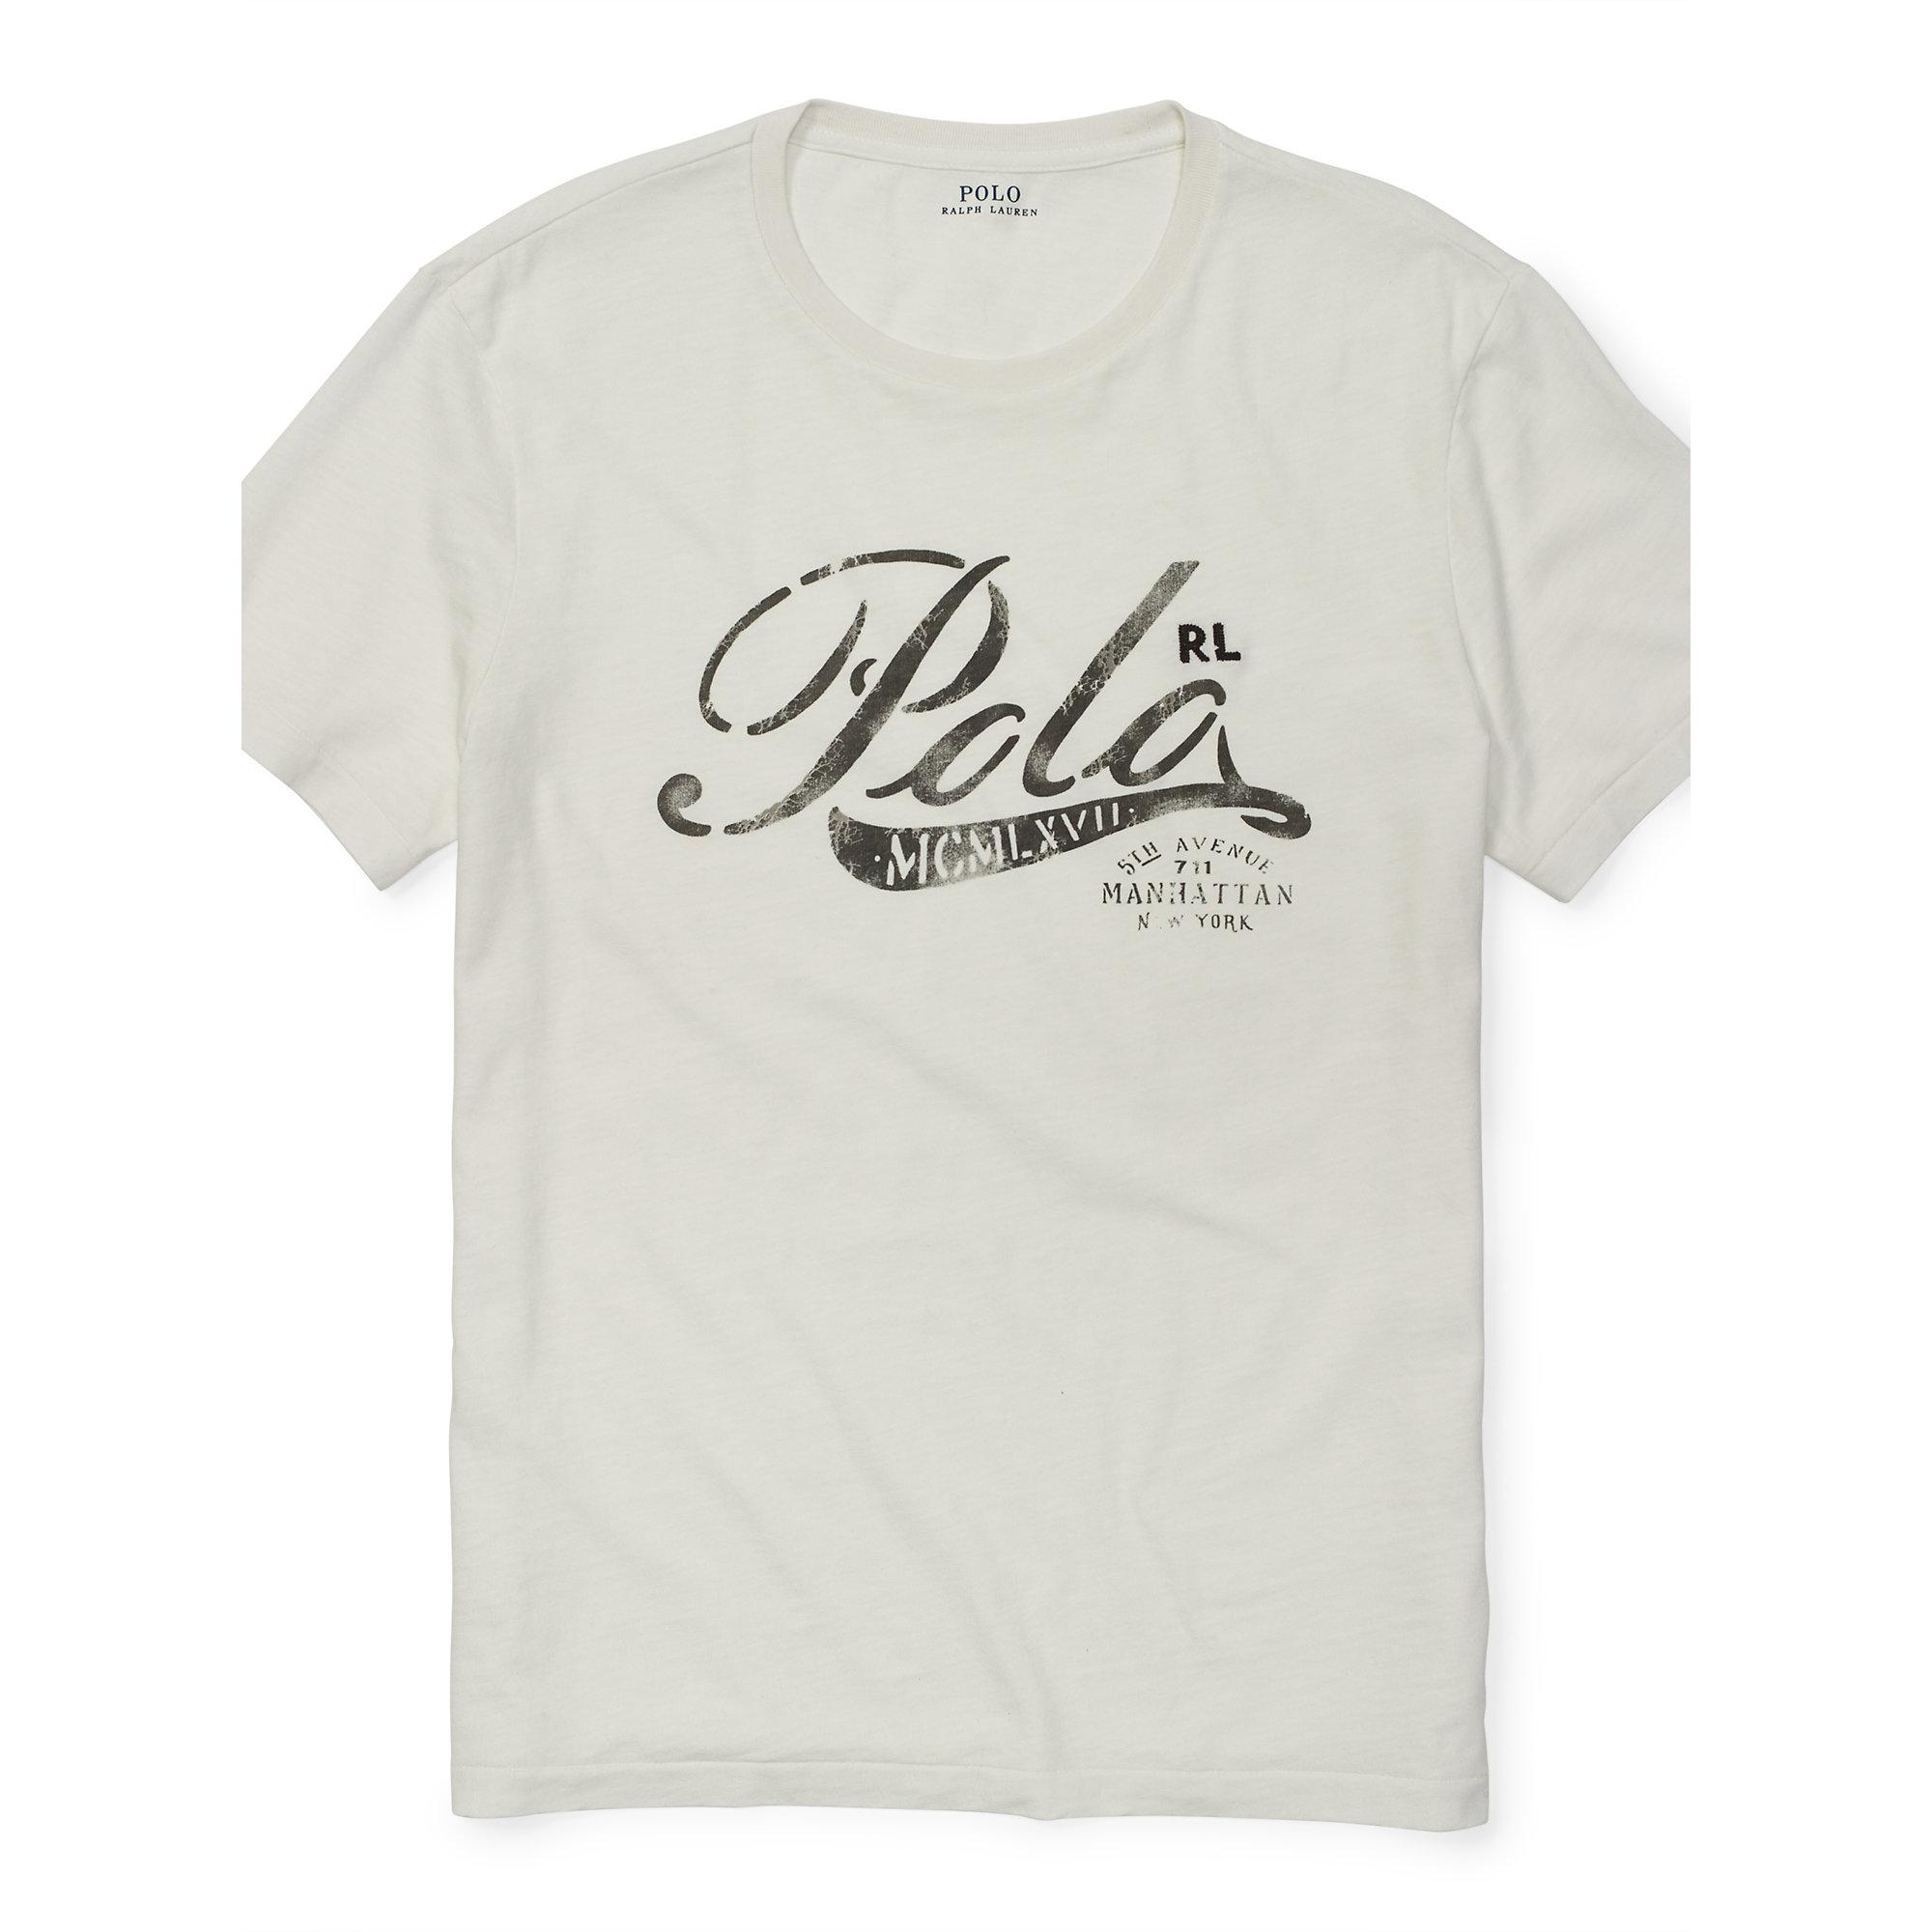 Polo ralph lauren cotton jersey graphic t shirt in white for Ralph lauren polo jersey shirt